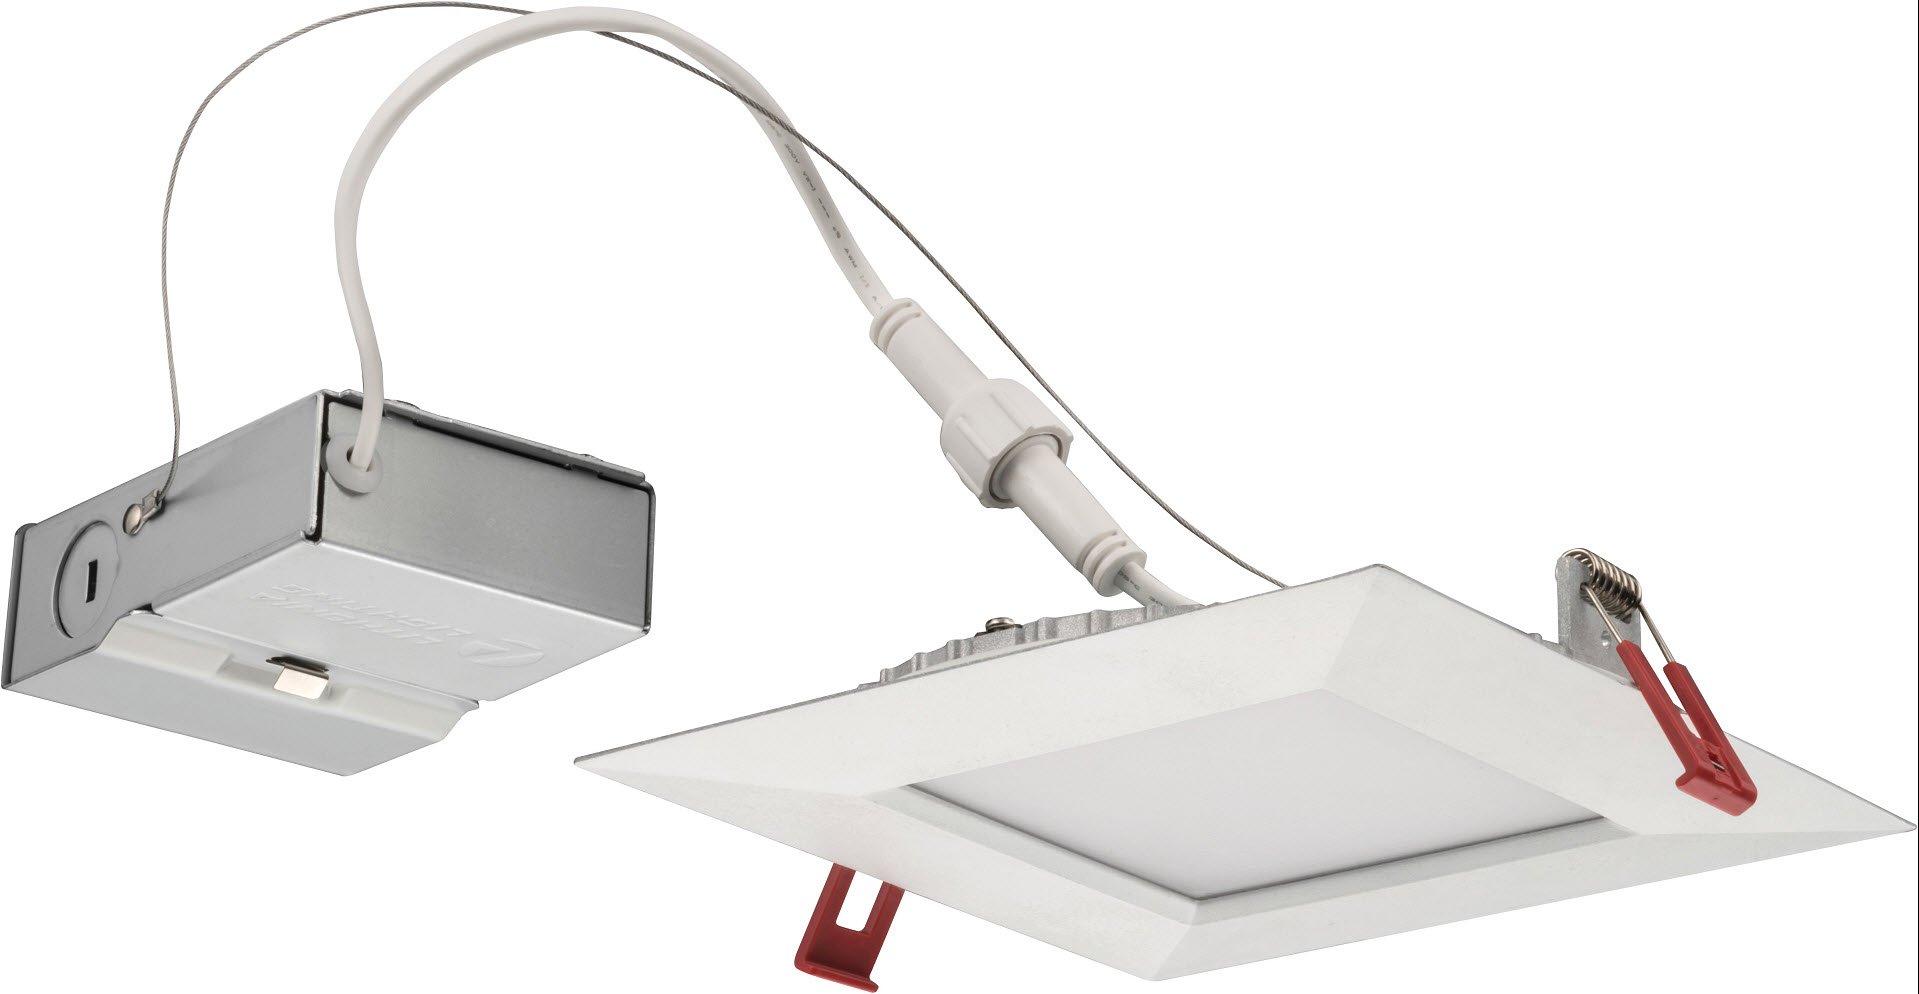 Lithonia Lighting WF6 SQ S LED 30K MW M6 Ultra-Thin Square LED Recessed Ceiling Light, 3000K | Bright White, Matte White